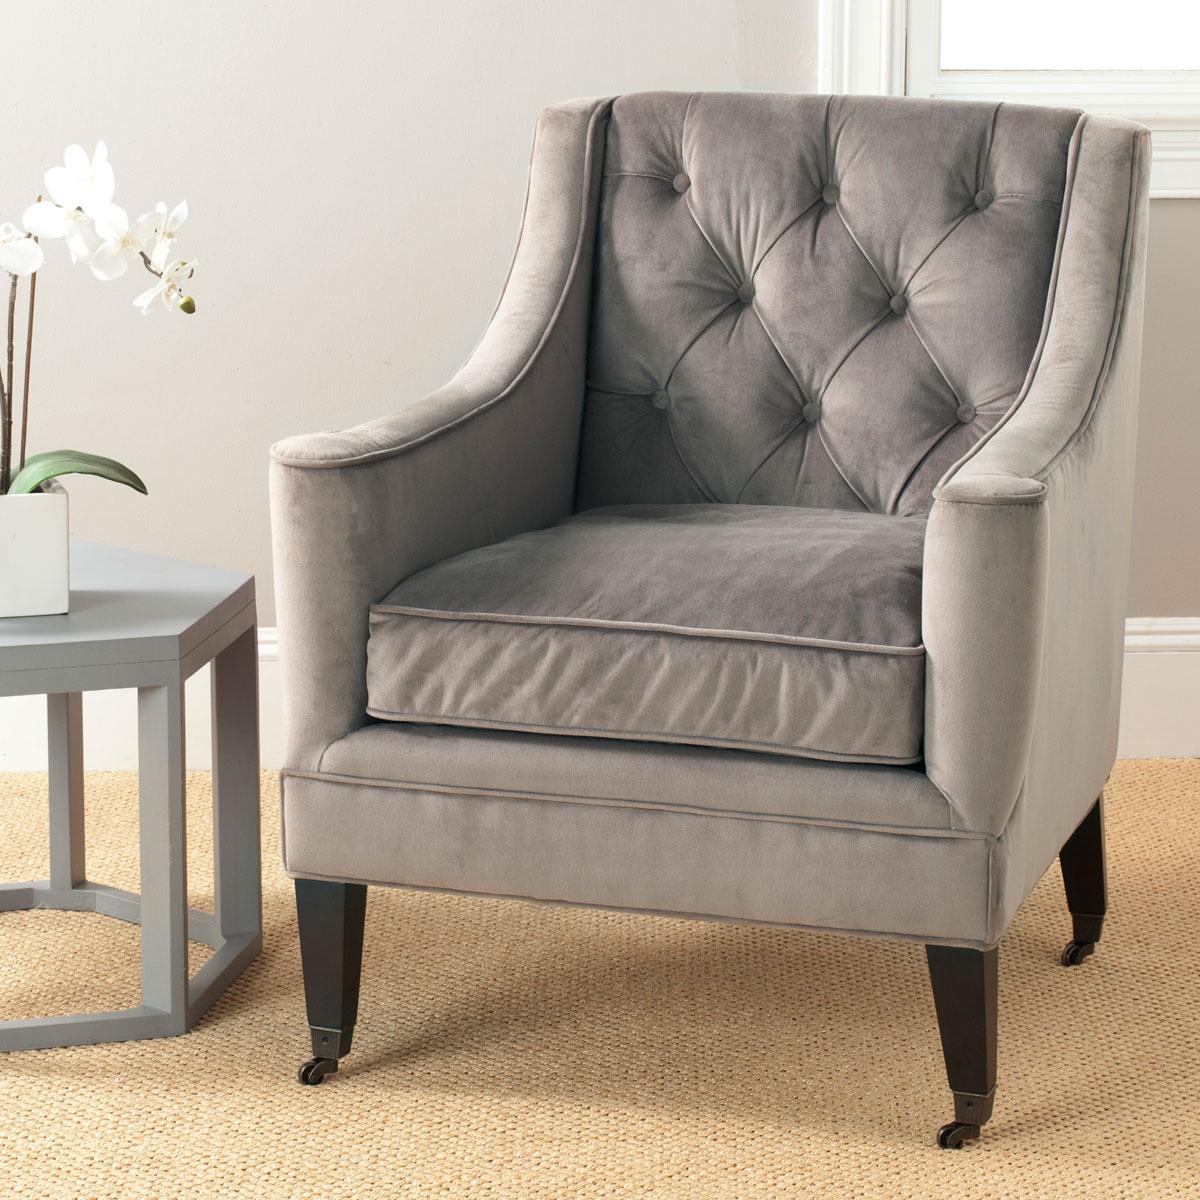 MCR4661B Accent Chairs - Furniture by Safavieh  Safavieh